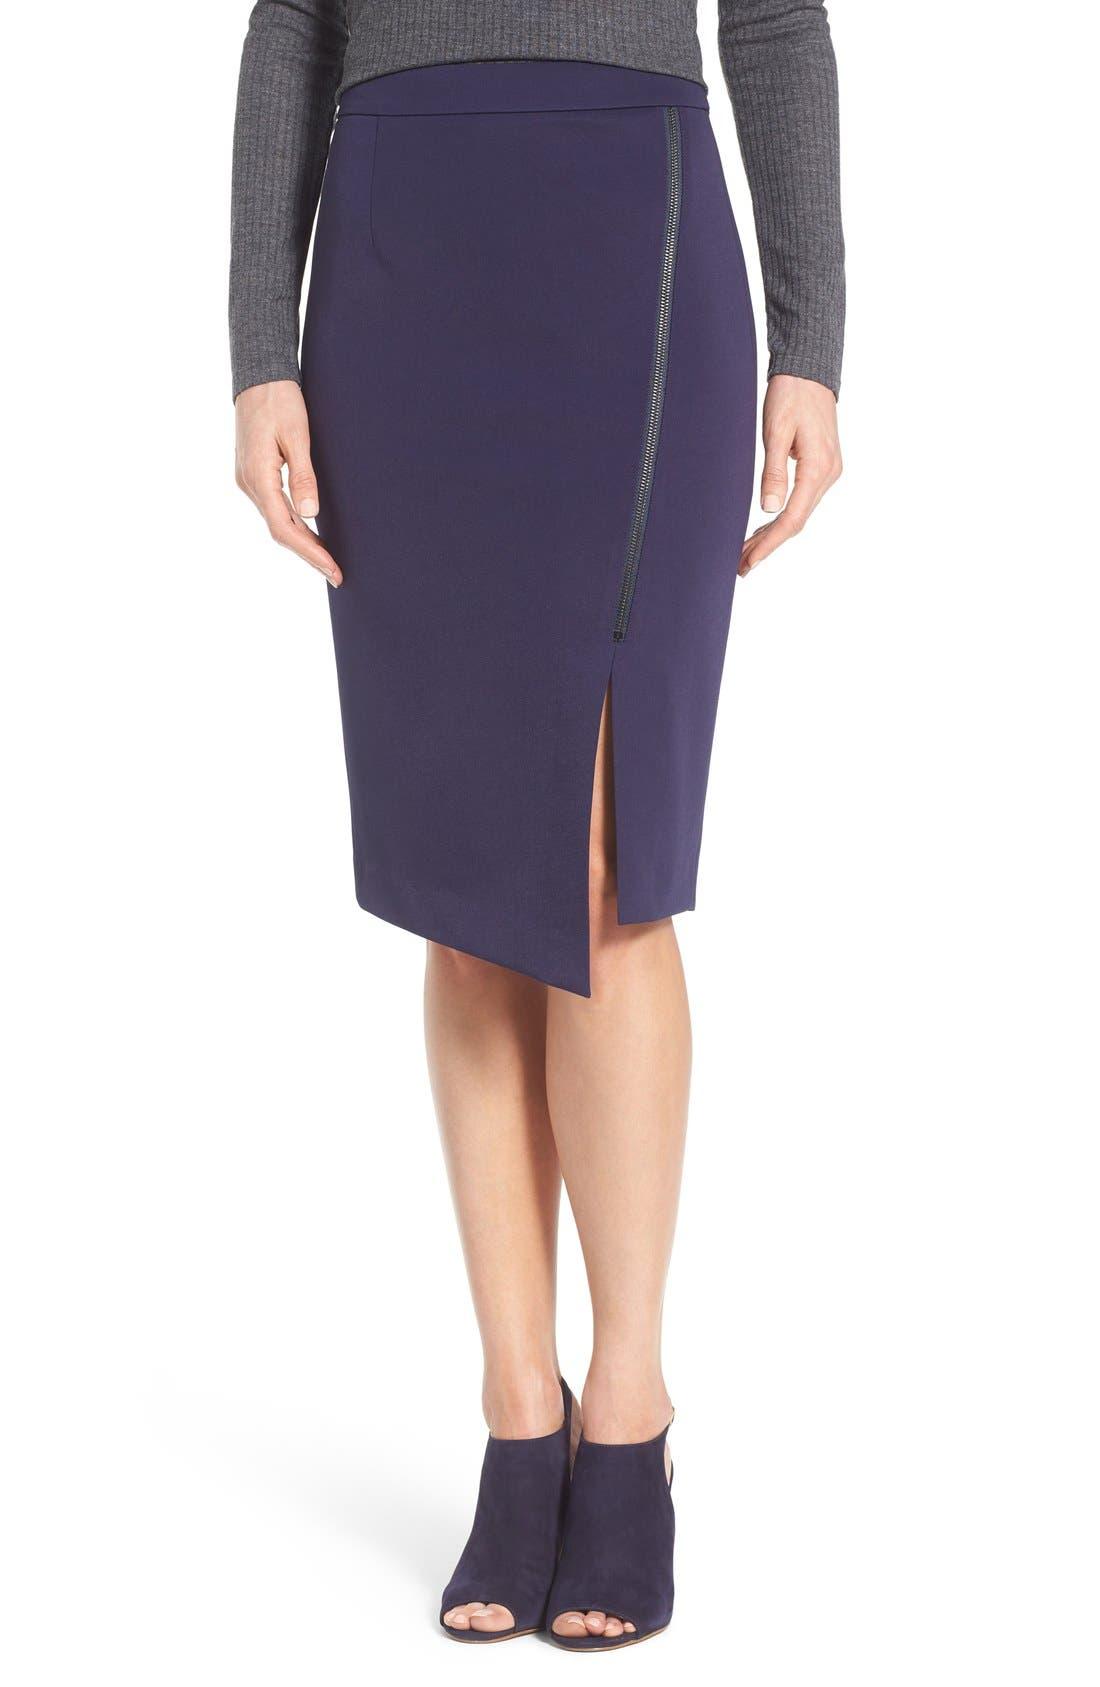 Alternate Image 1 Selected - Halogen® Asymmetrical Zip Pencil Skirt (Regular & Petite)